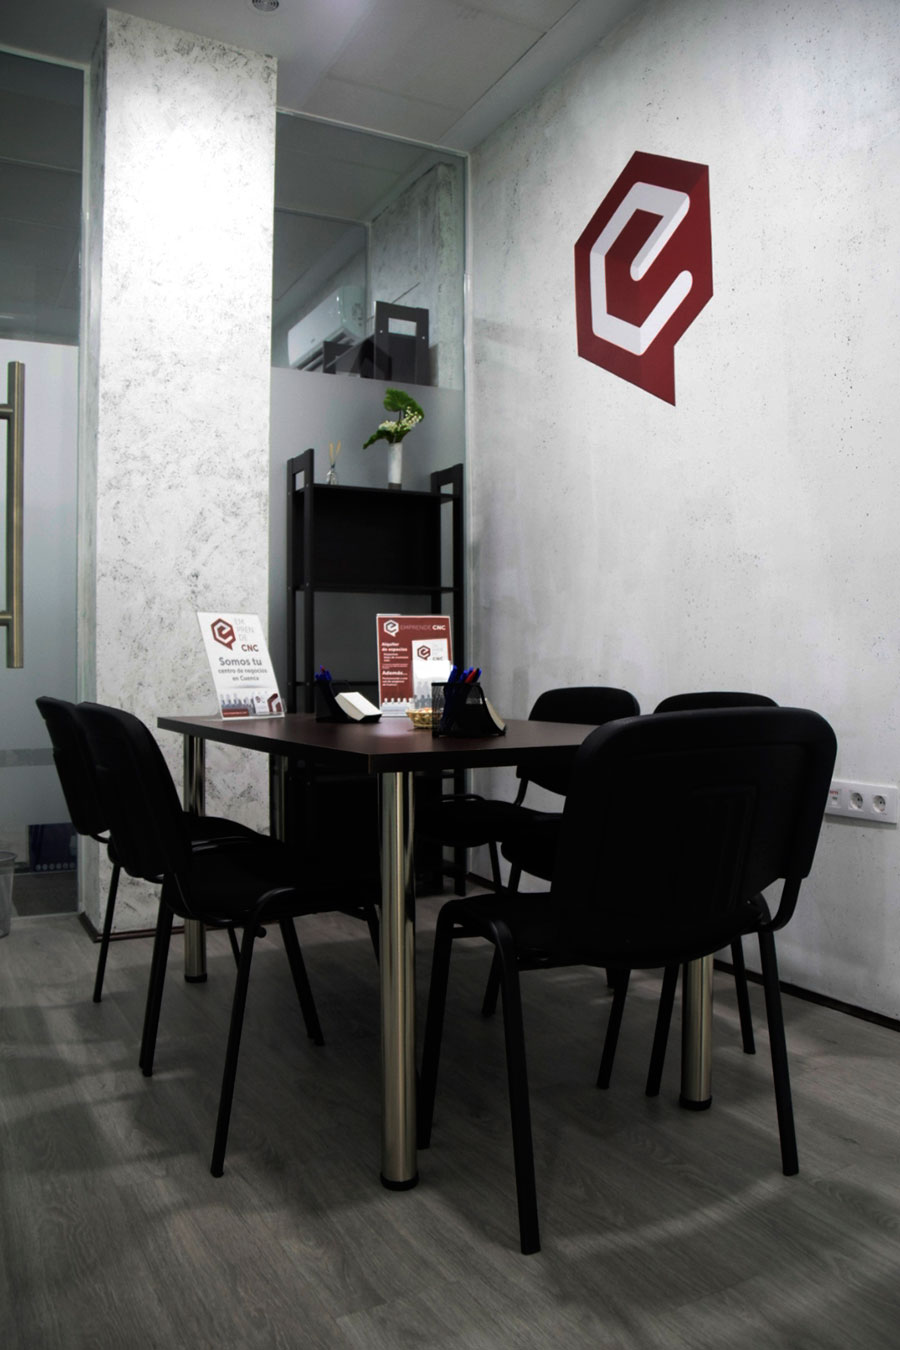 Sala I de reuniones emprende CNC